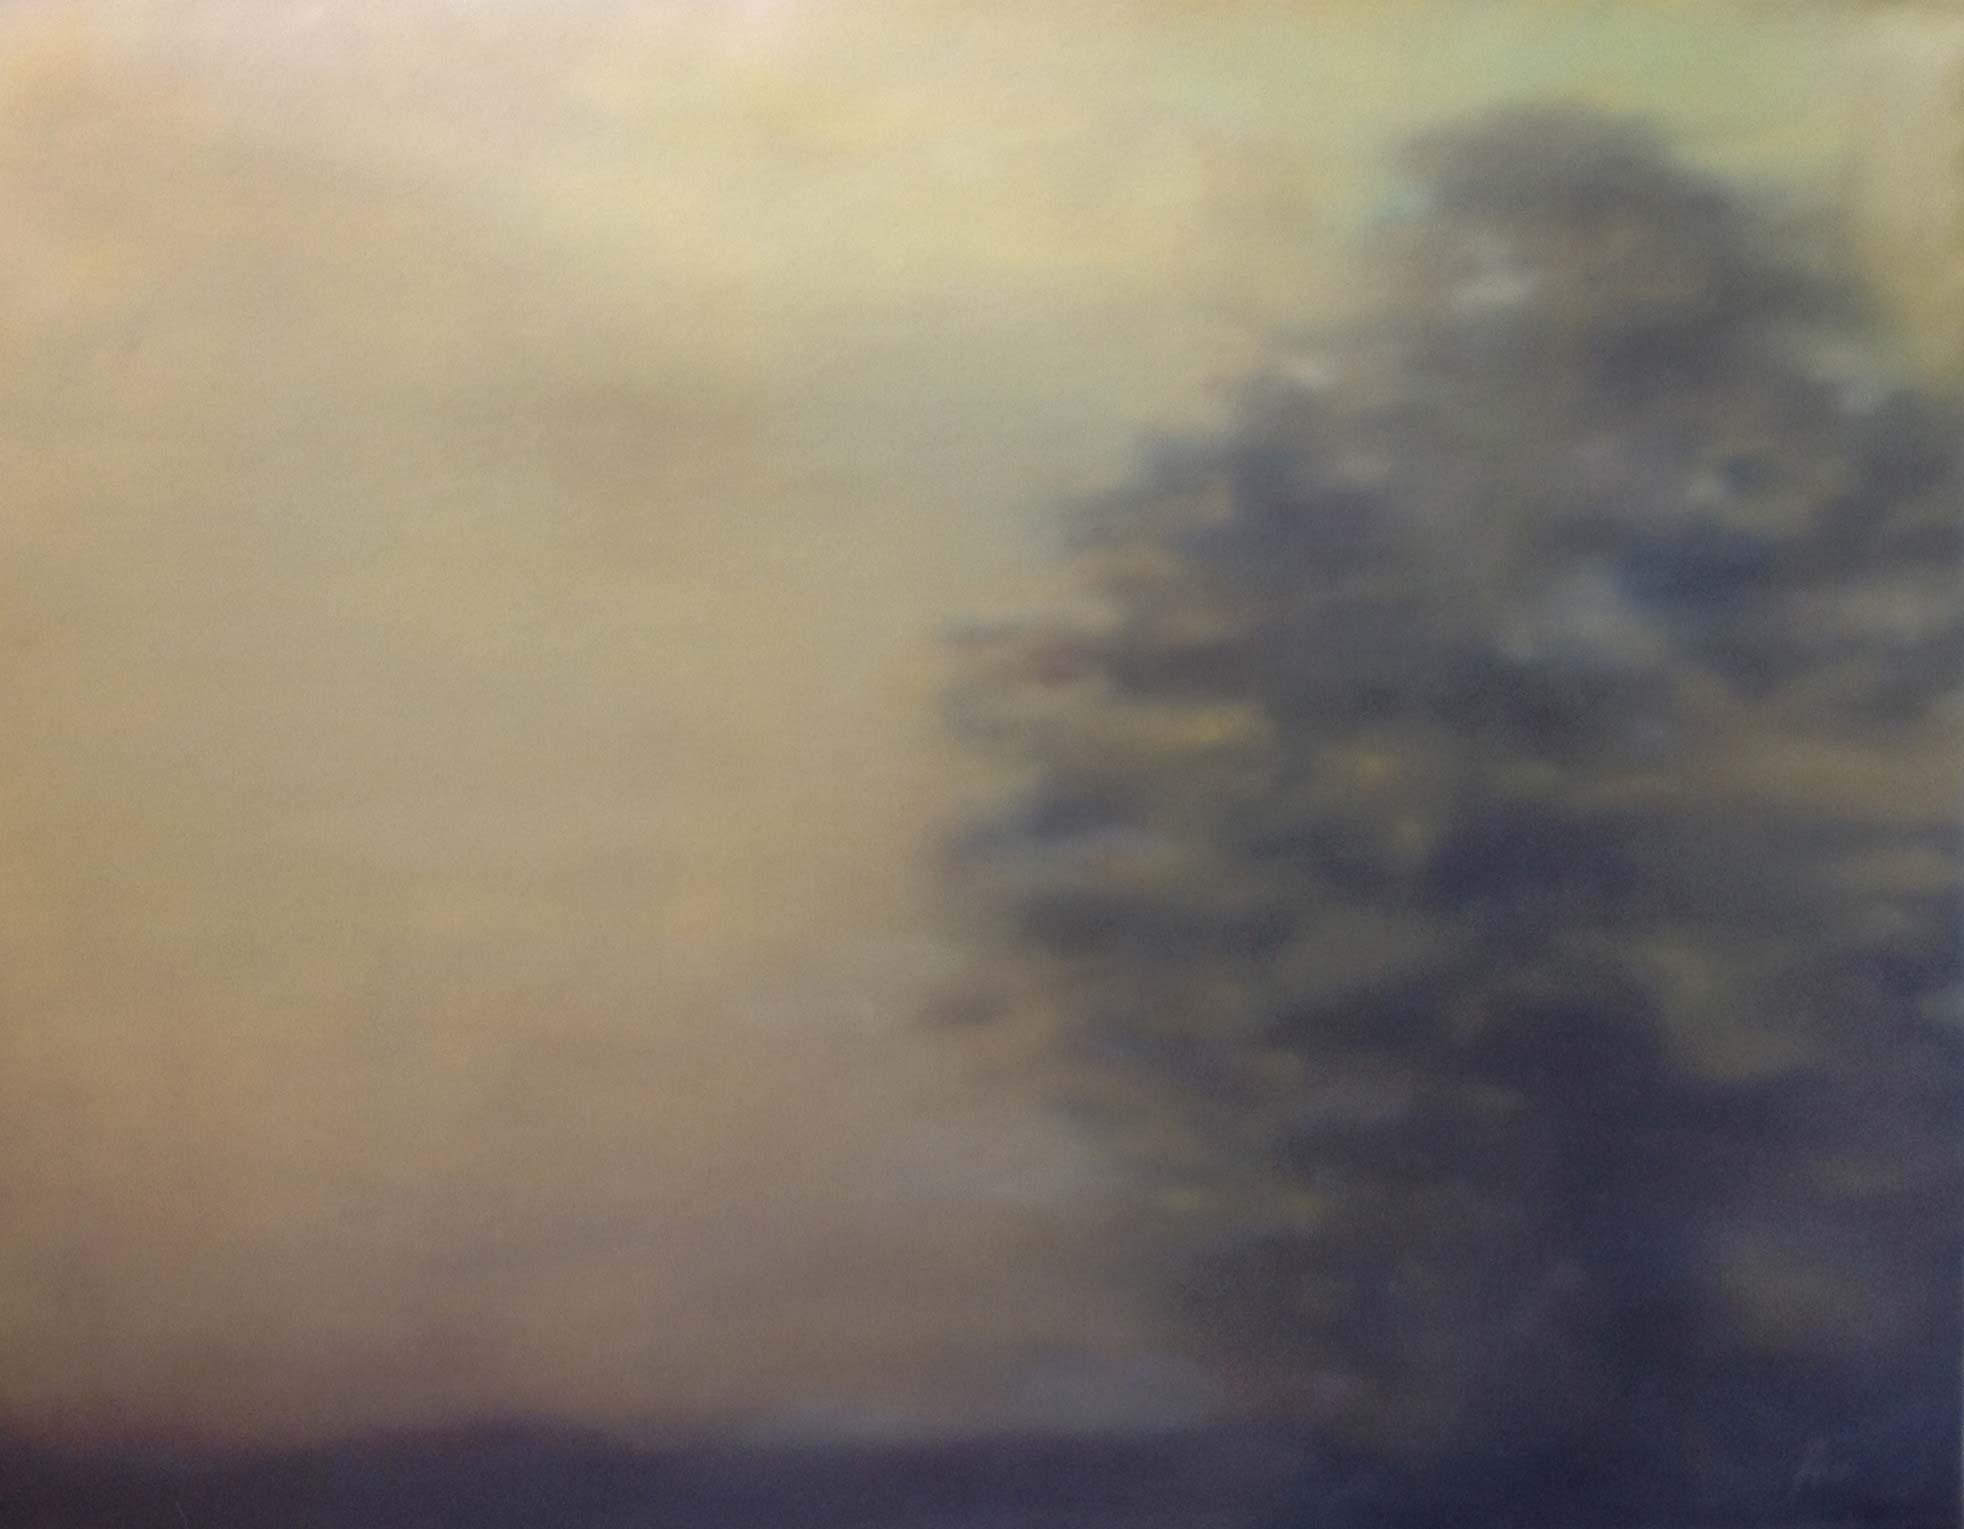 Bruised - Maria Patrizi